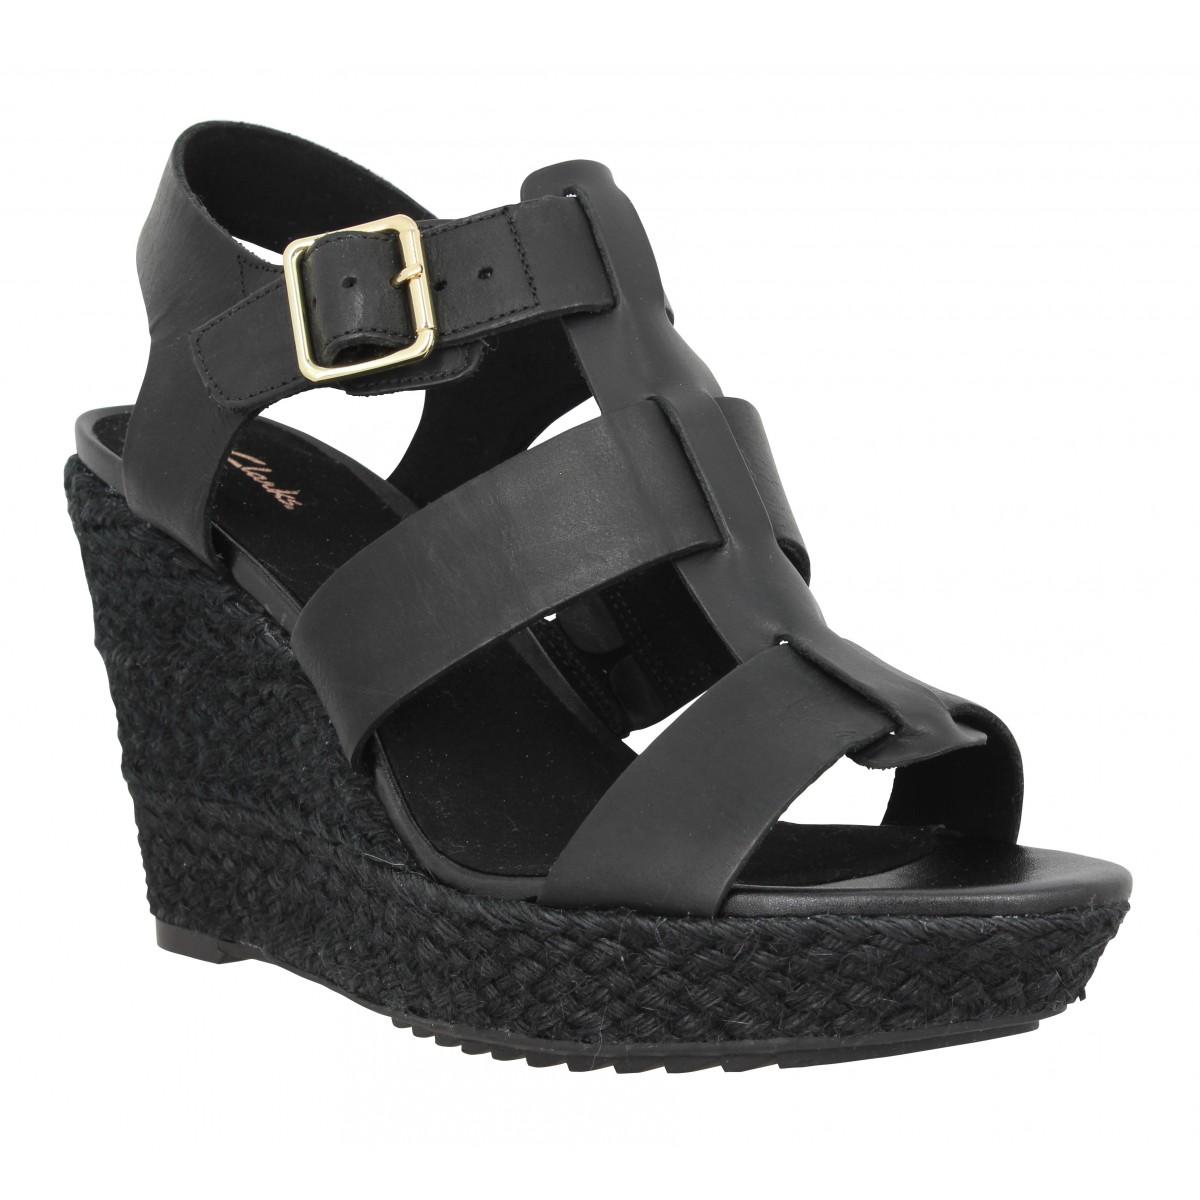 Sandales talons CLARKS Maritsa95 Glad cuir Femme Noir